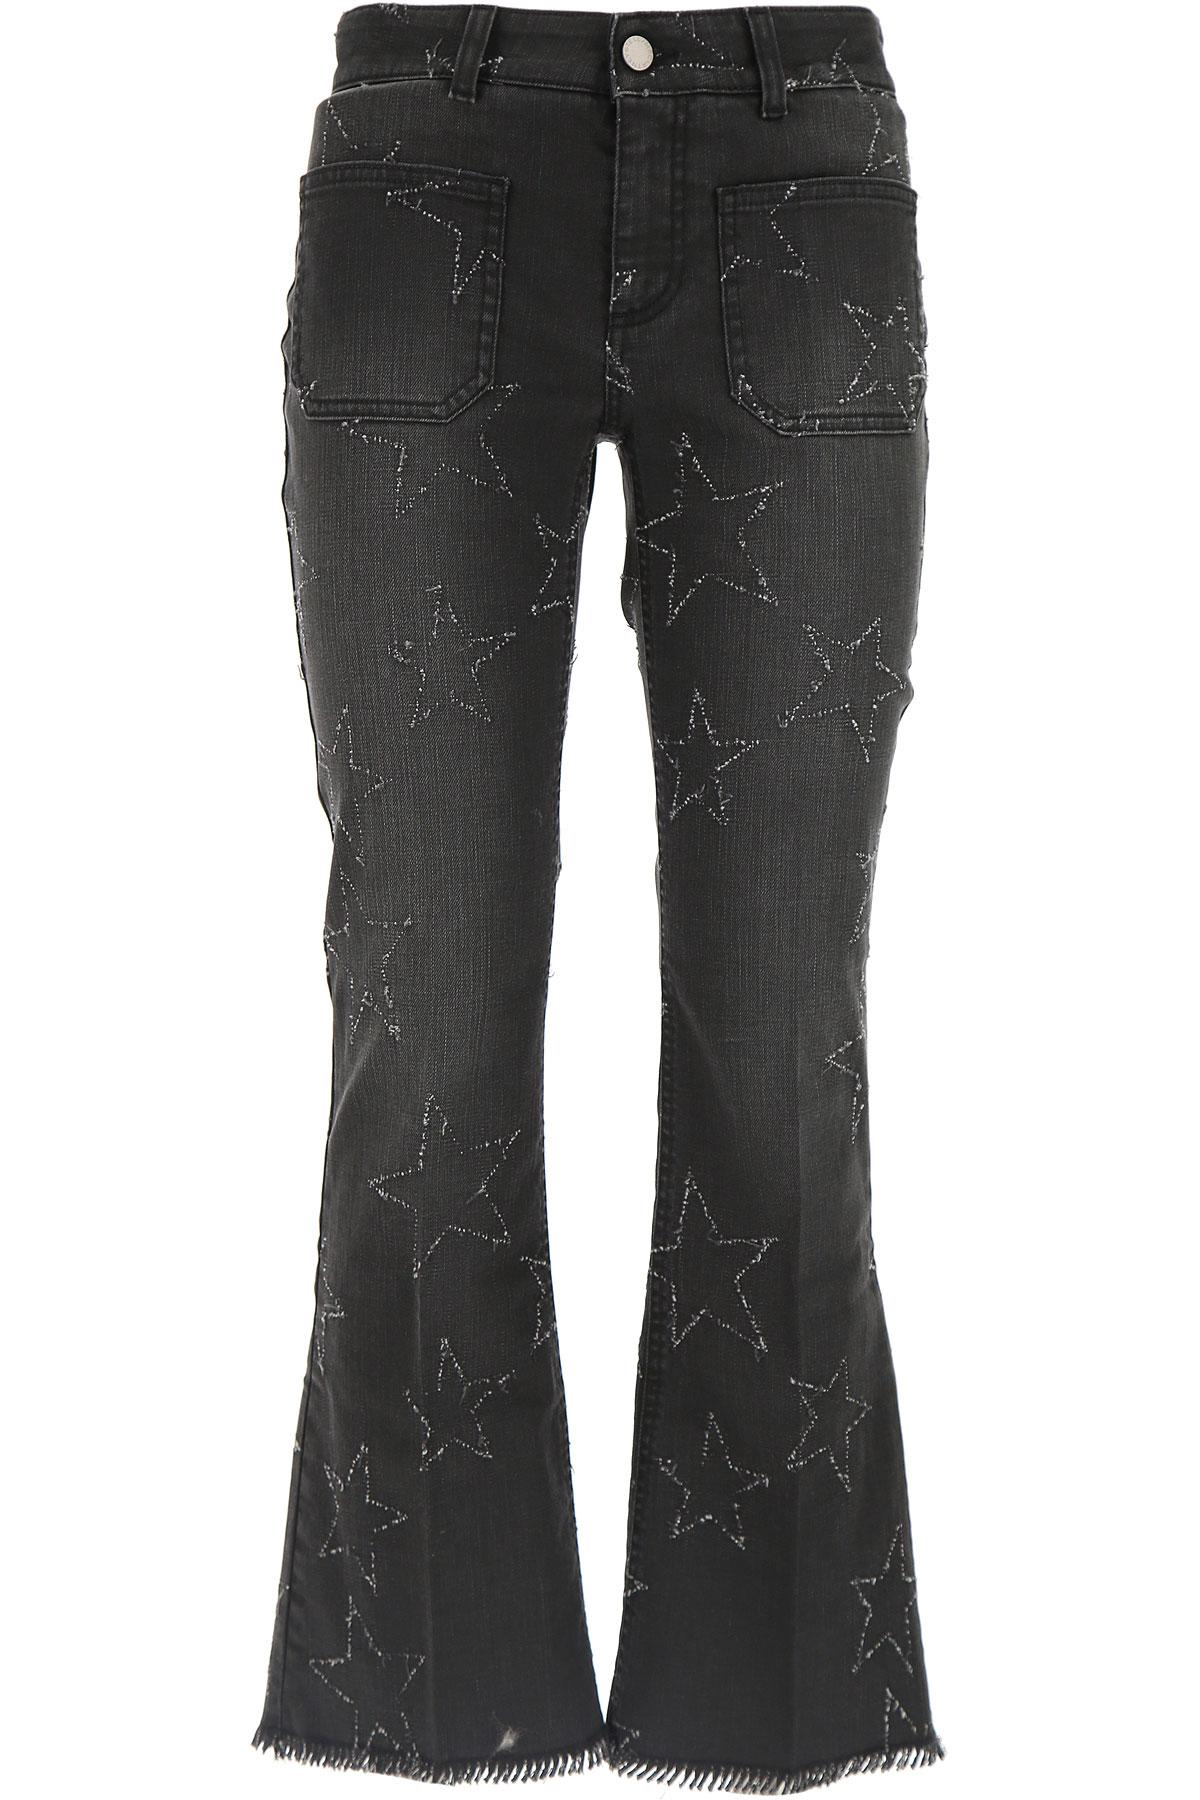 Stella McCartney Jeans, Black, Cotton, 2017, 26 27 29 USA-432055